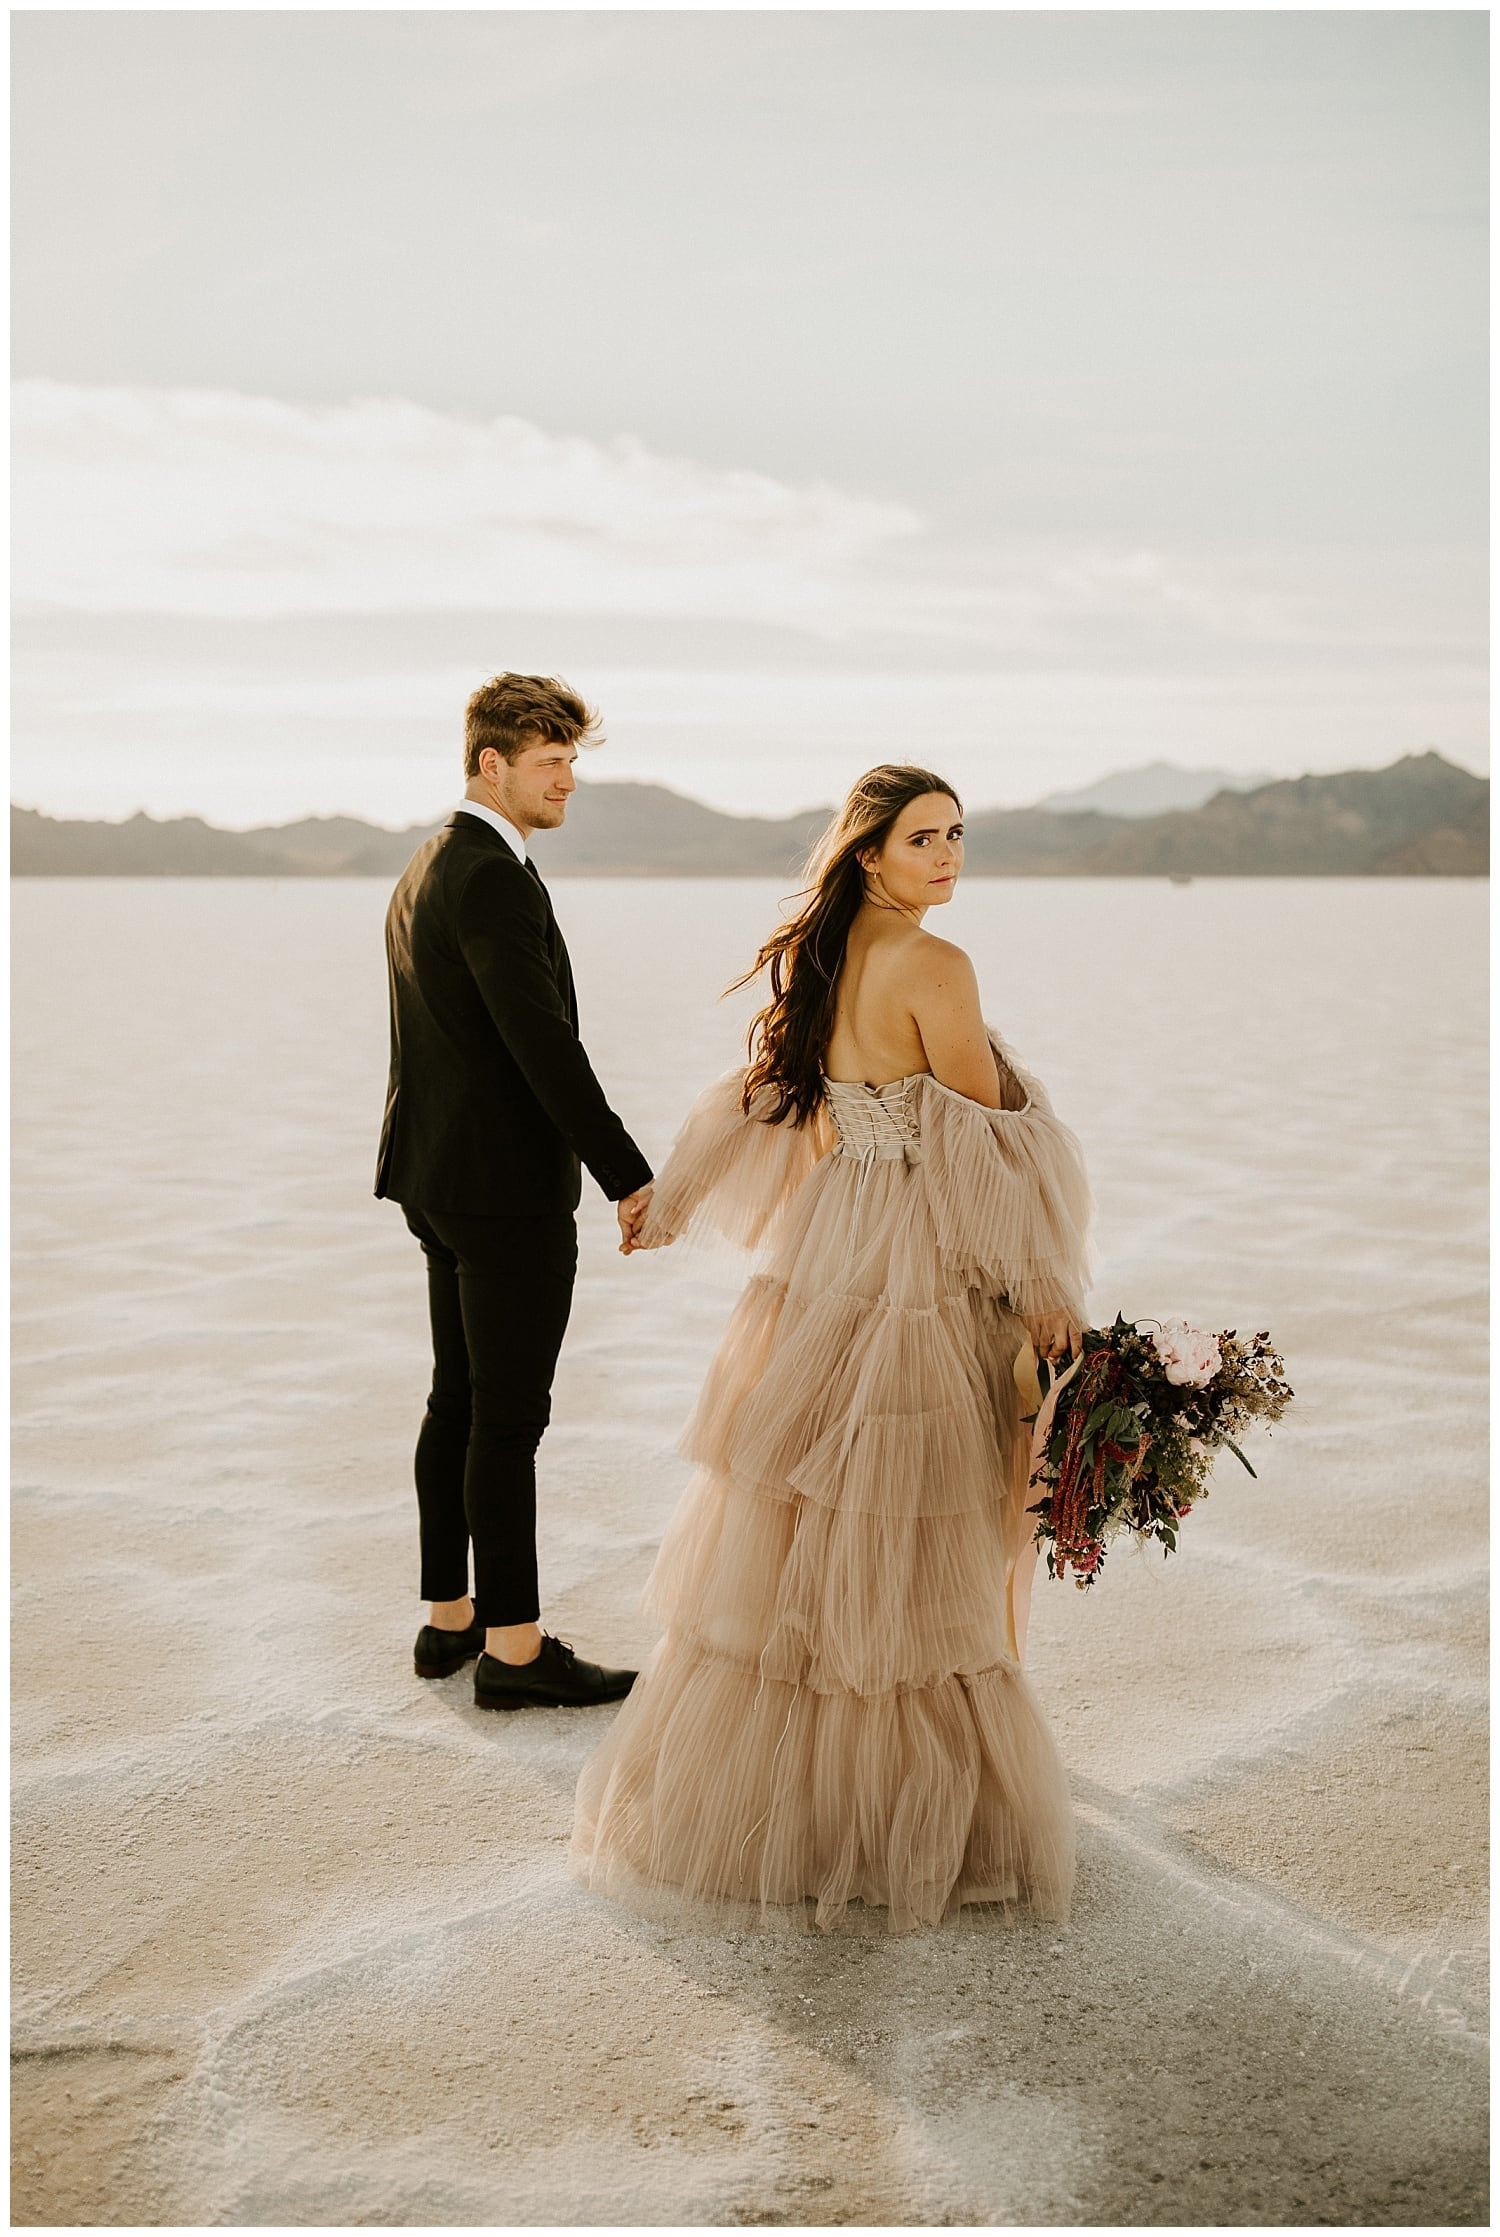 dreamy utah elopement, wedding photographers in utah, salt lake city photographers